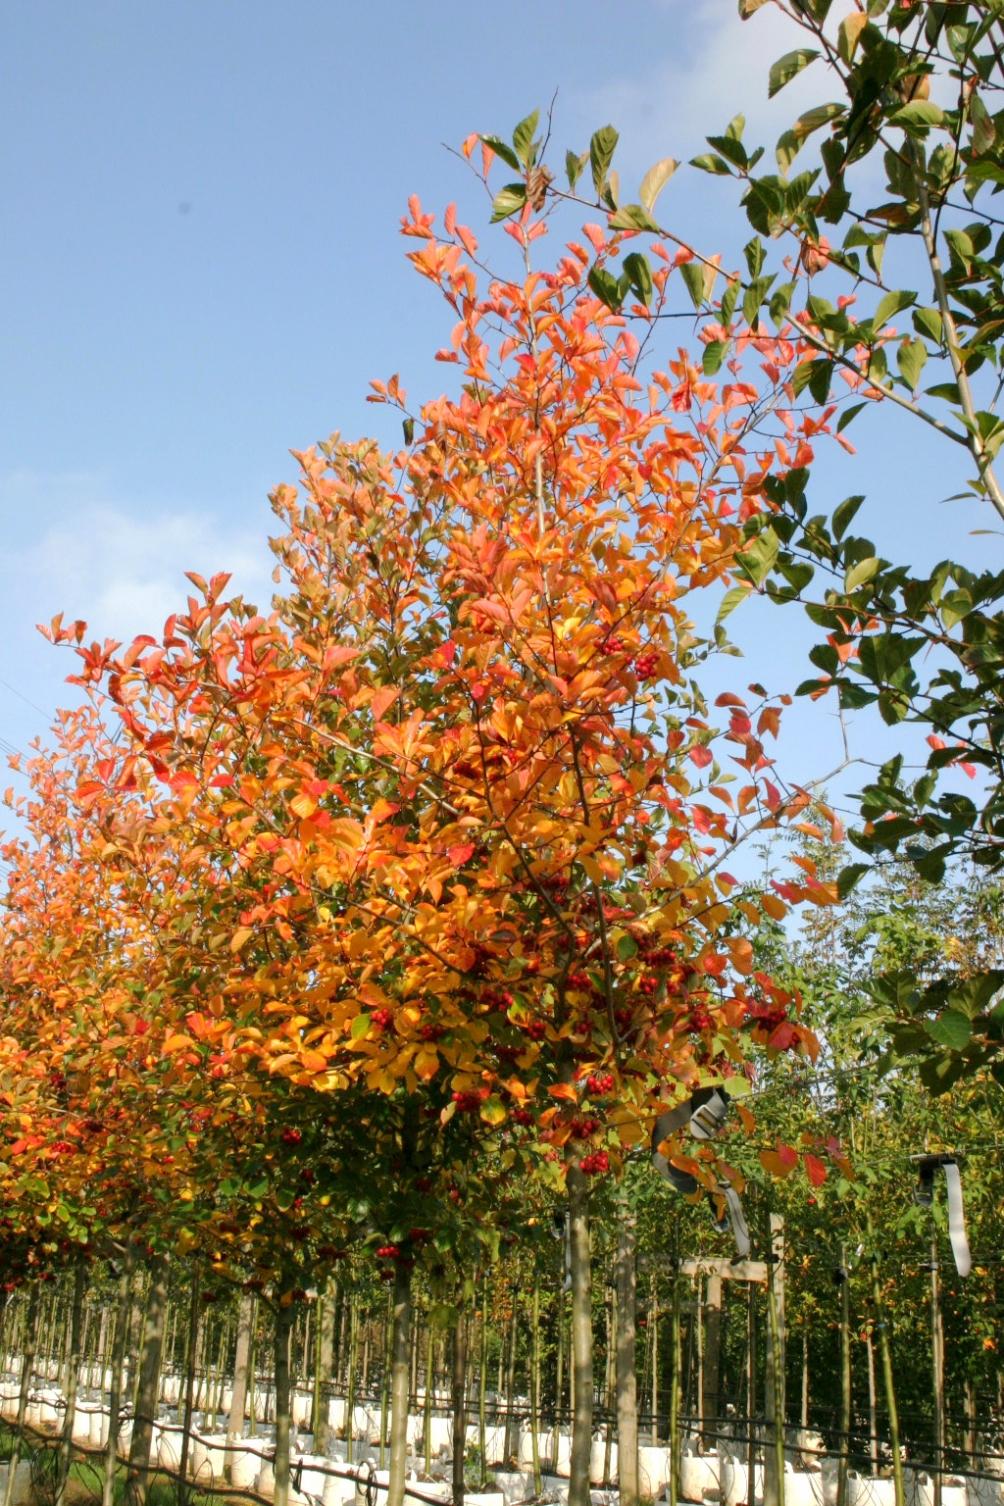 autumn colour of   Crataegus x prunifolia Splendens